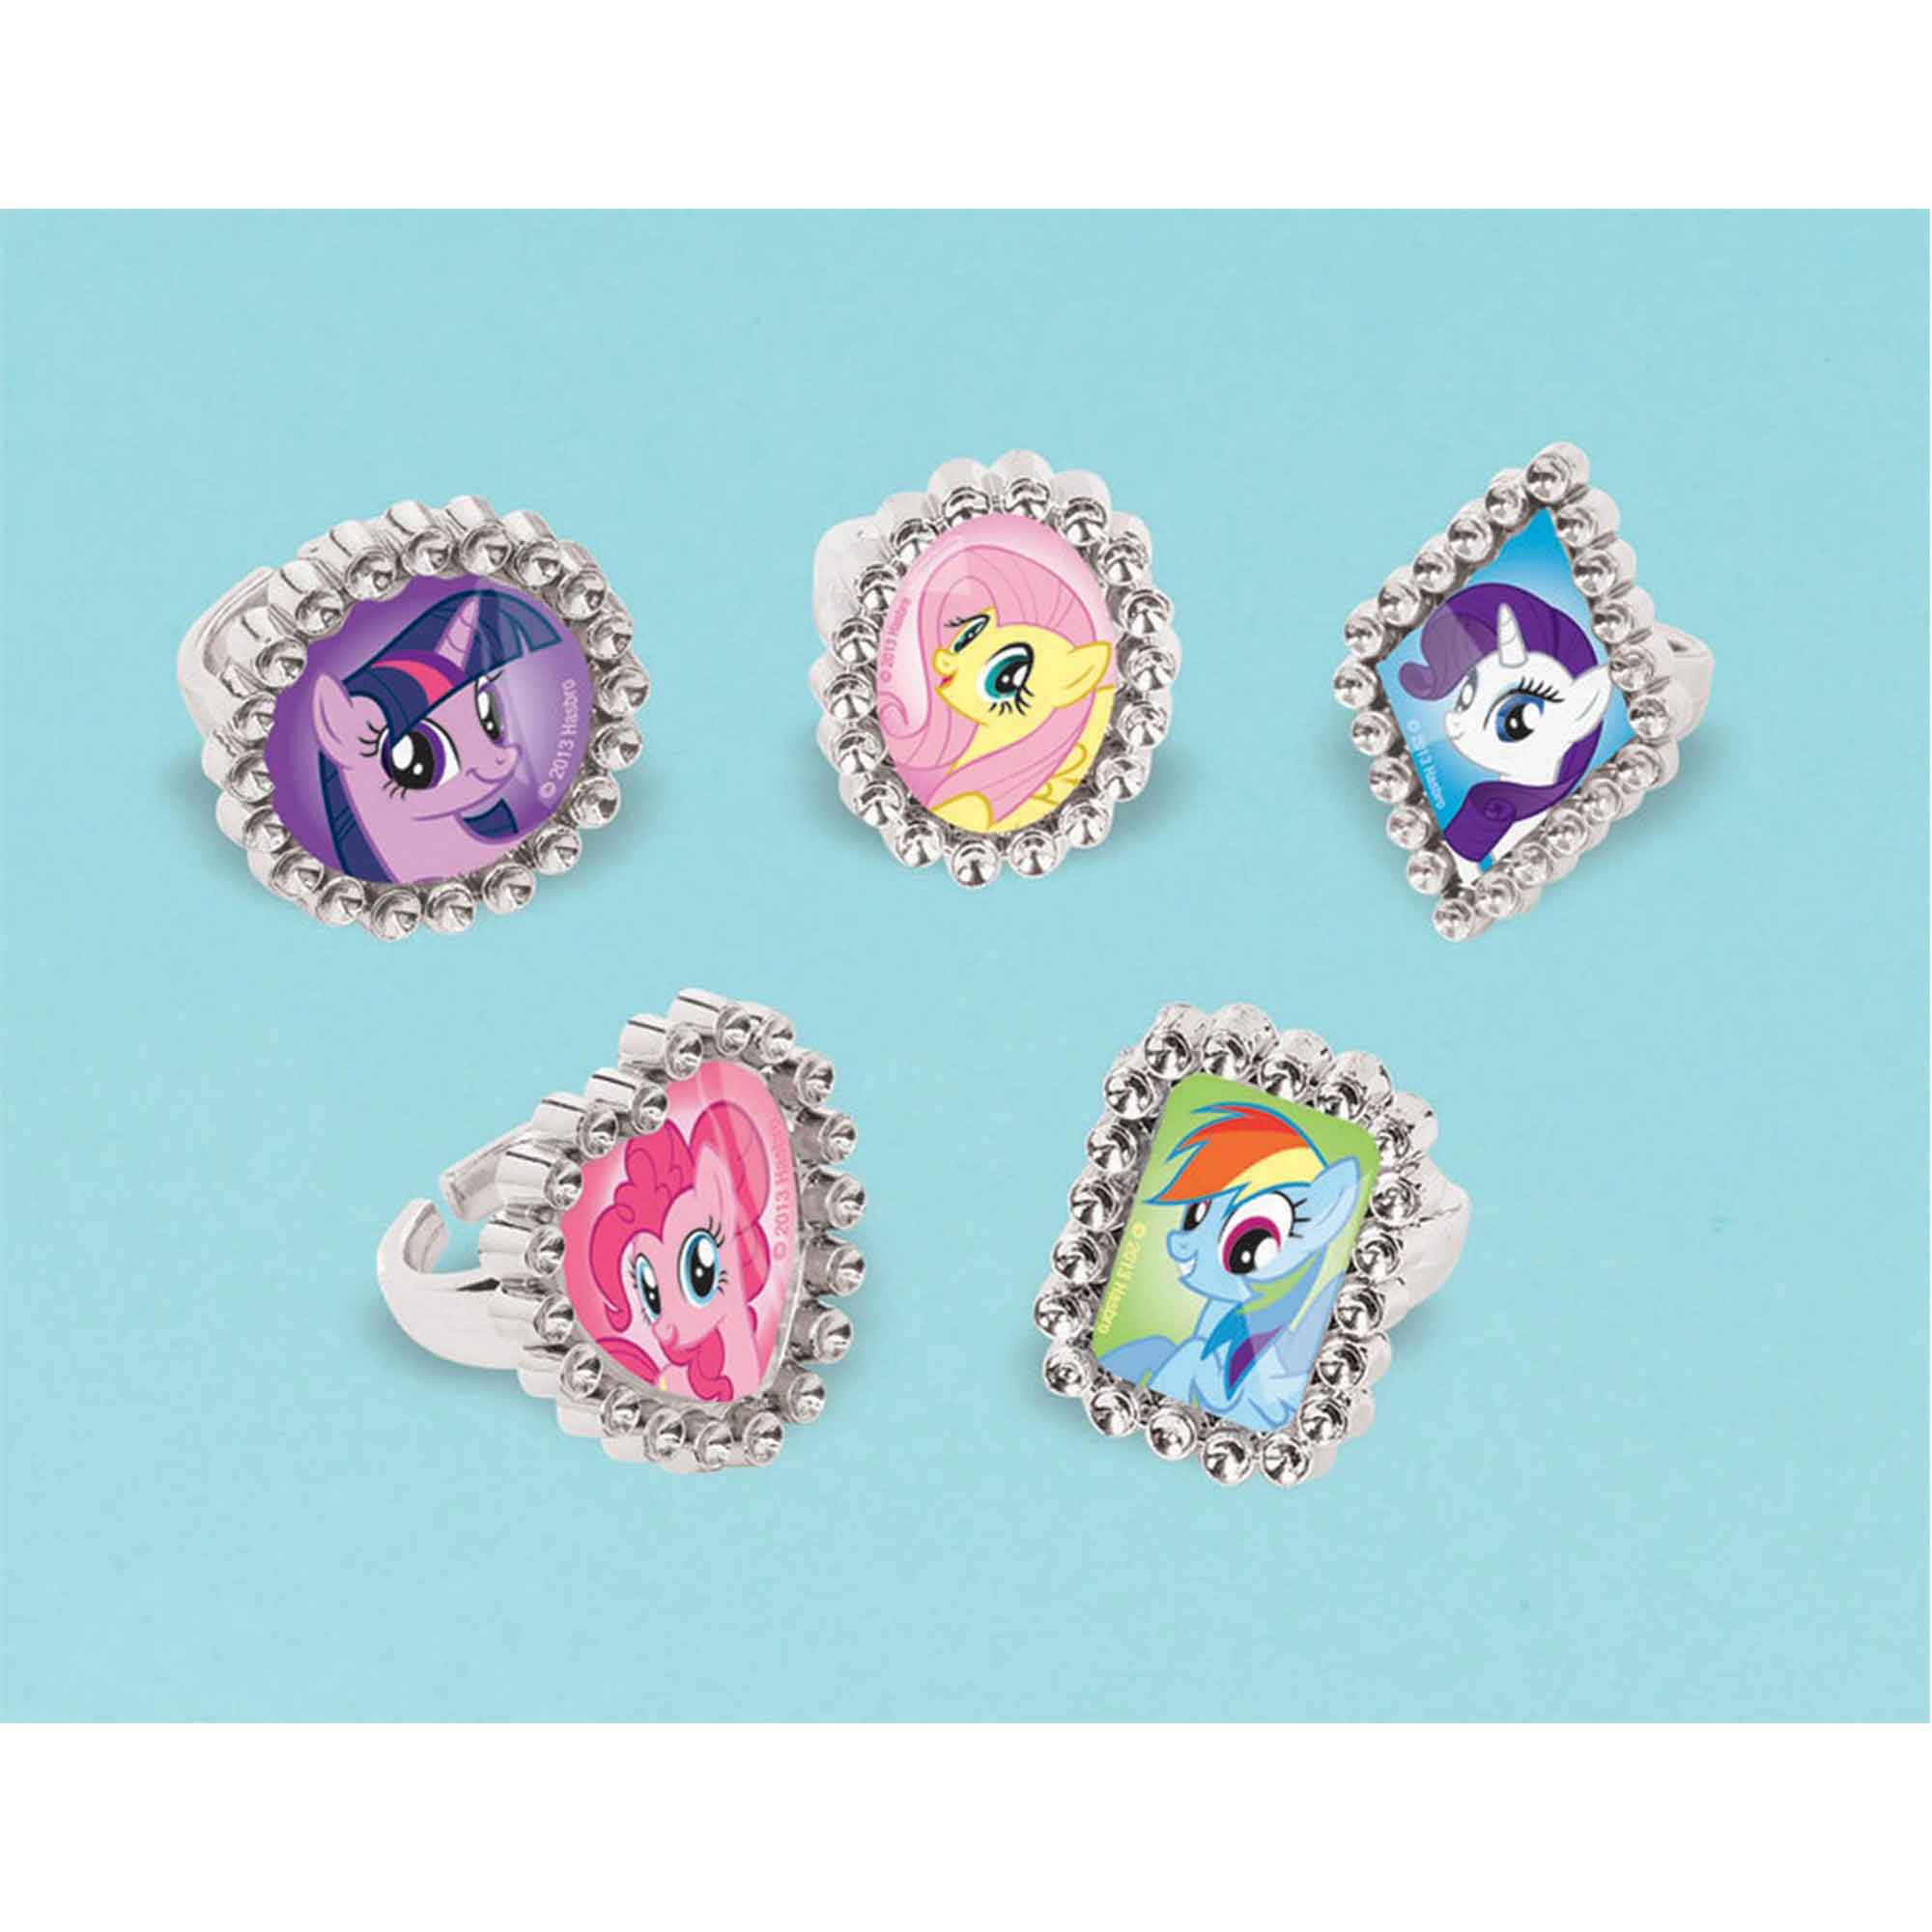 My Little Pony Friendship Jewel Ring Favor